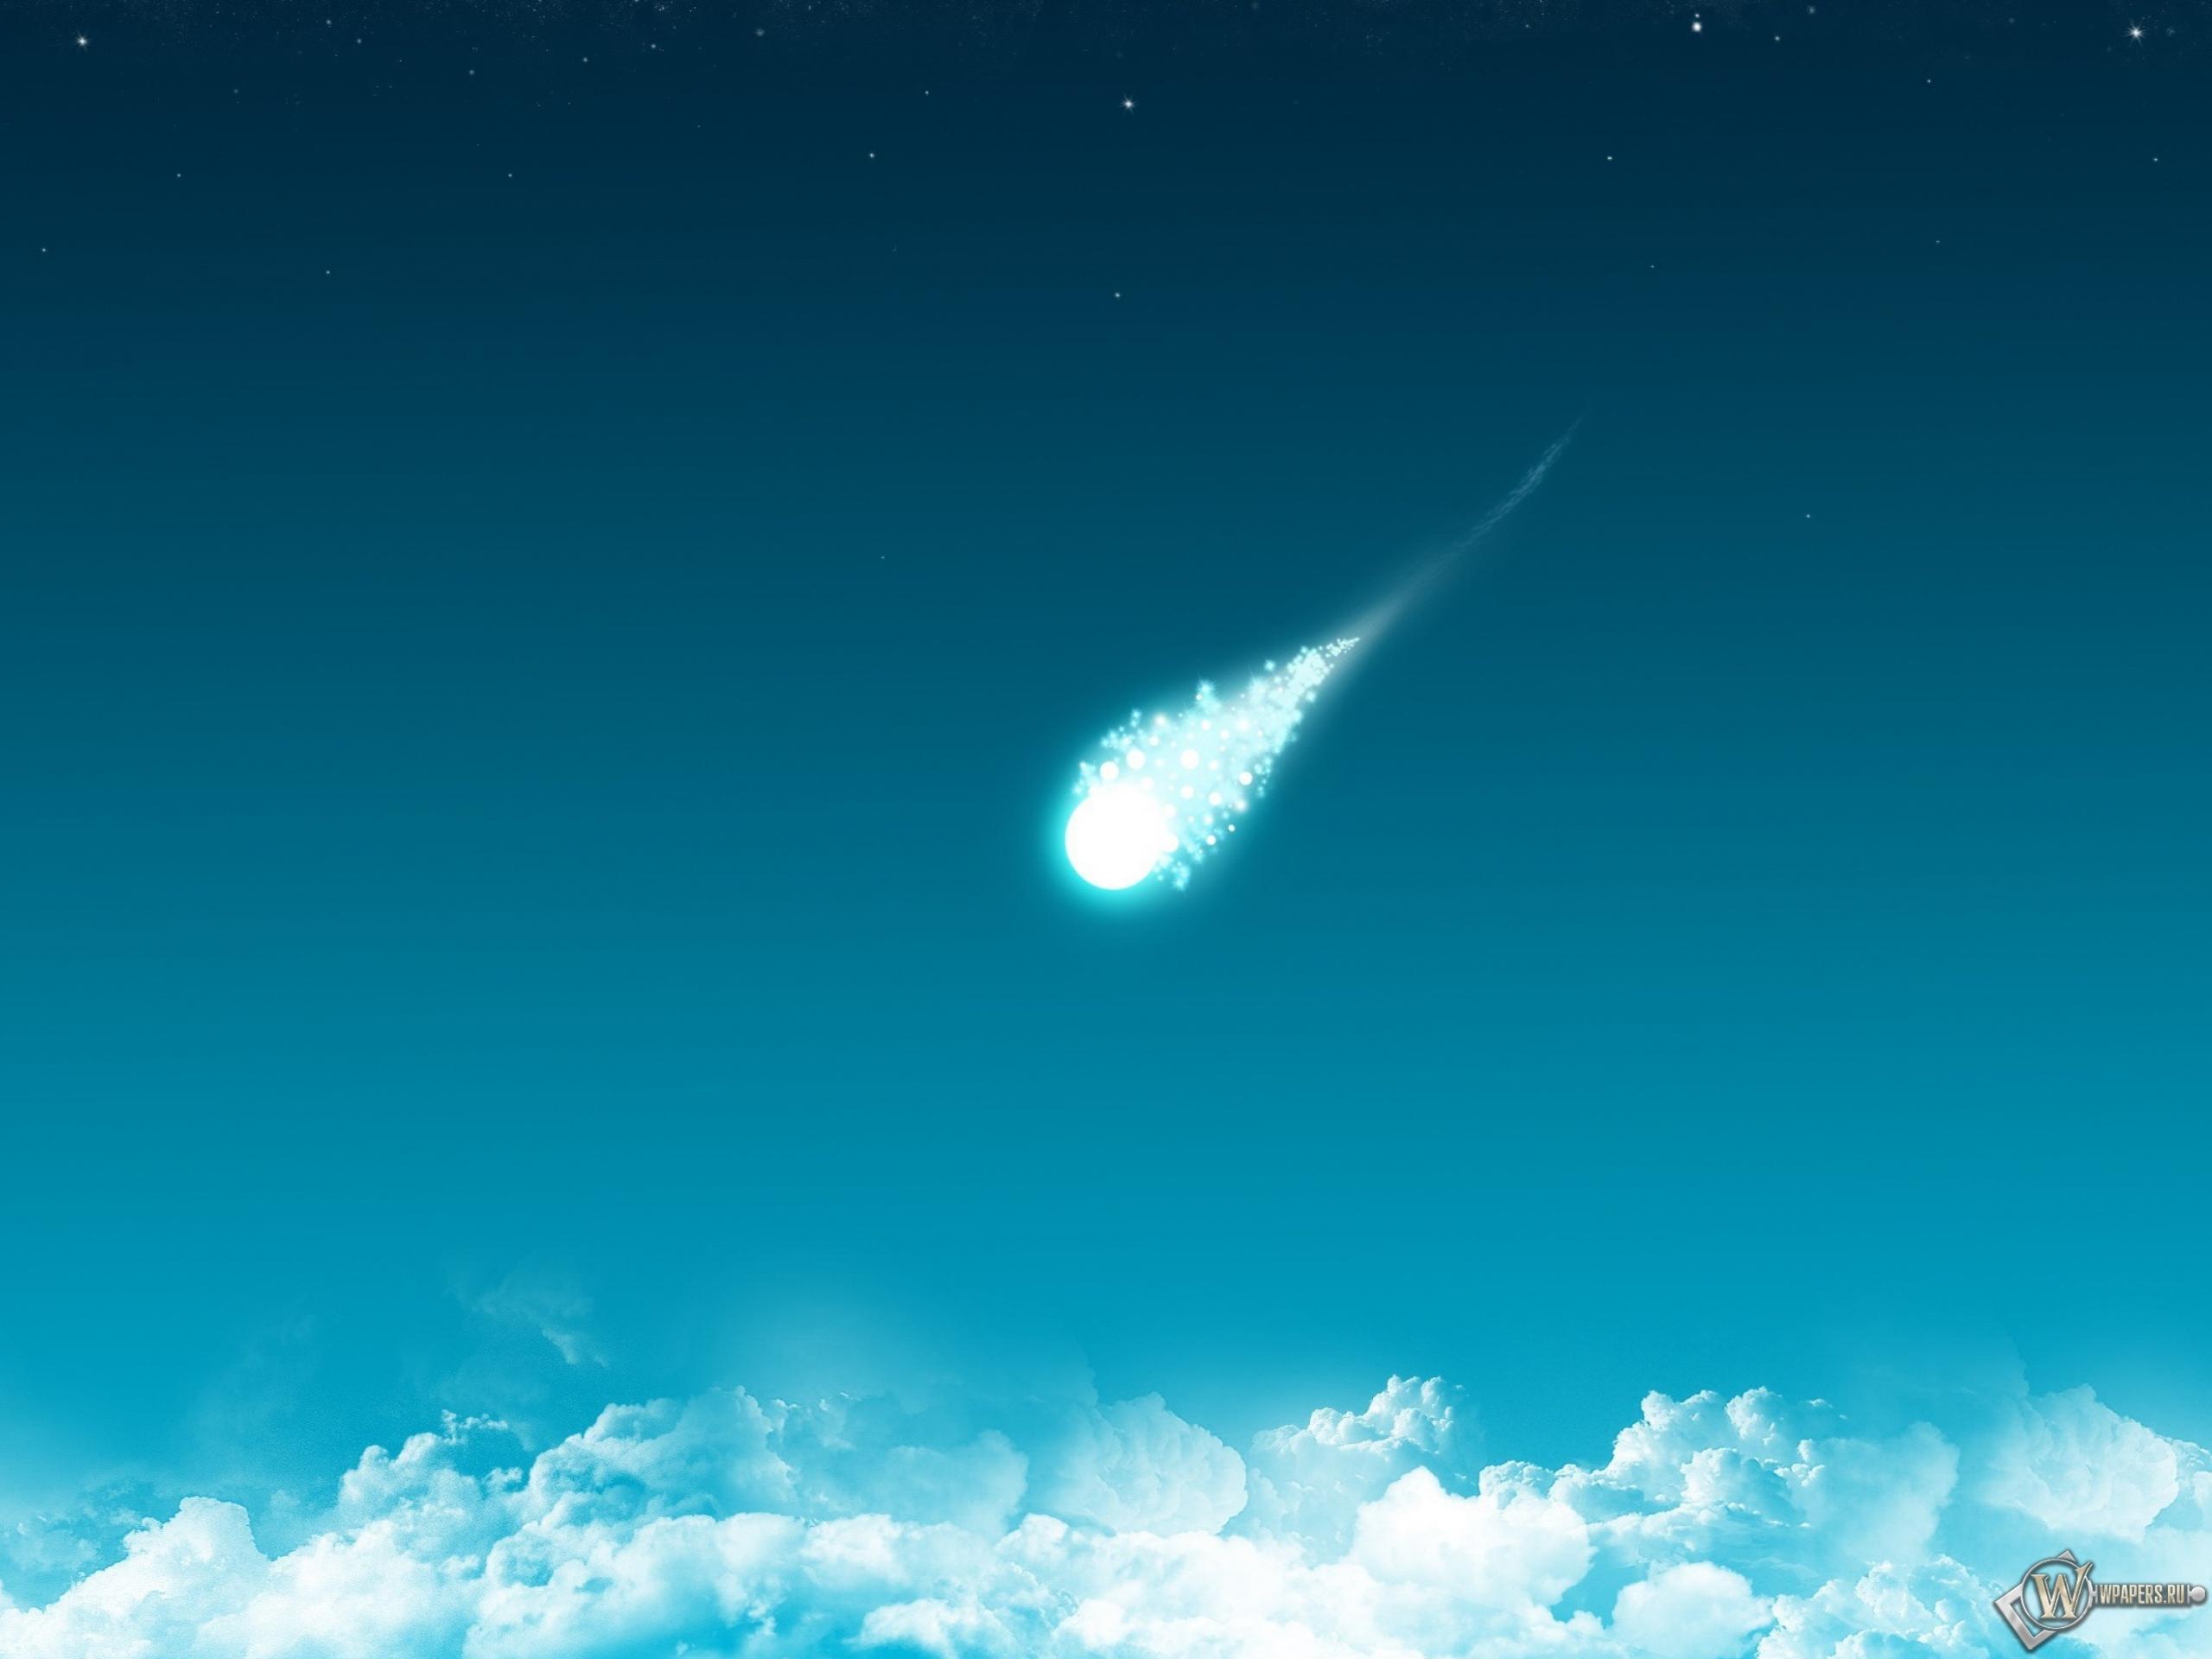 Комета  № 174171 бесплатно